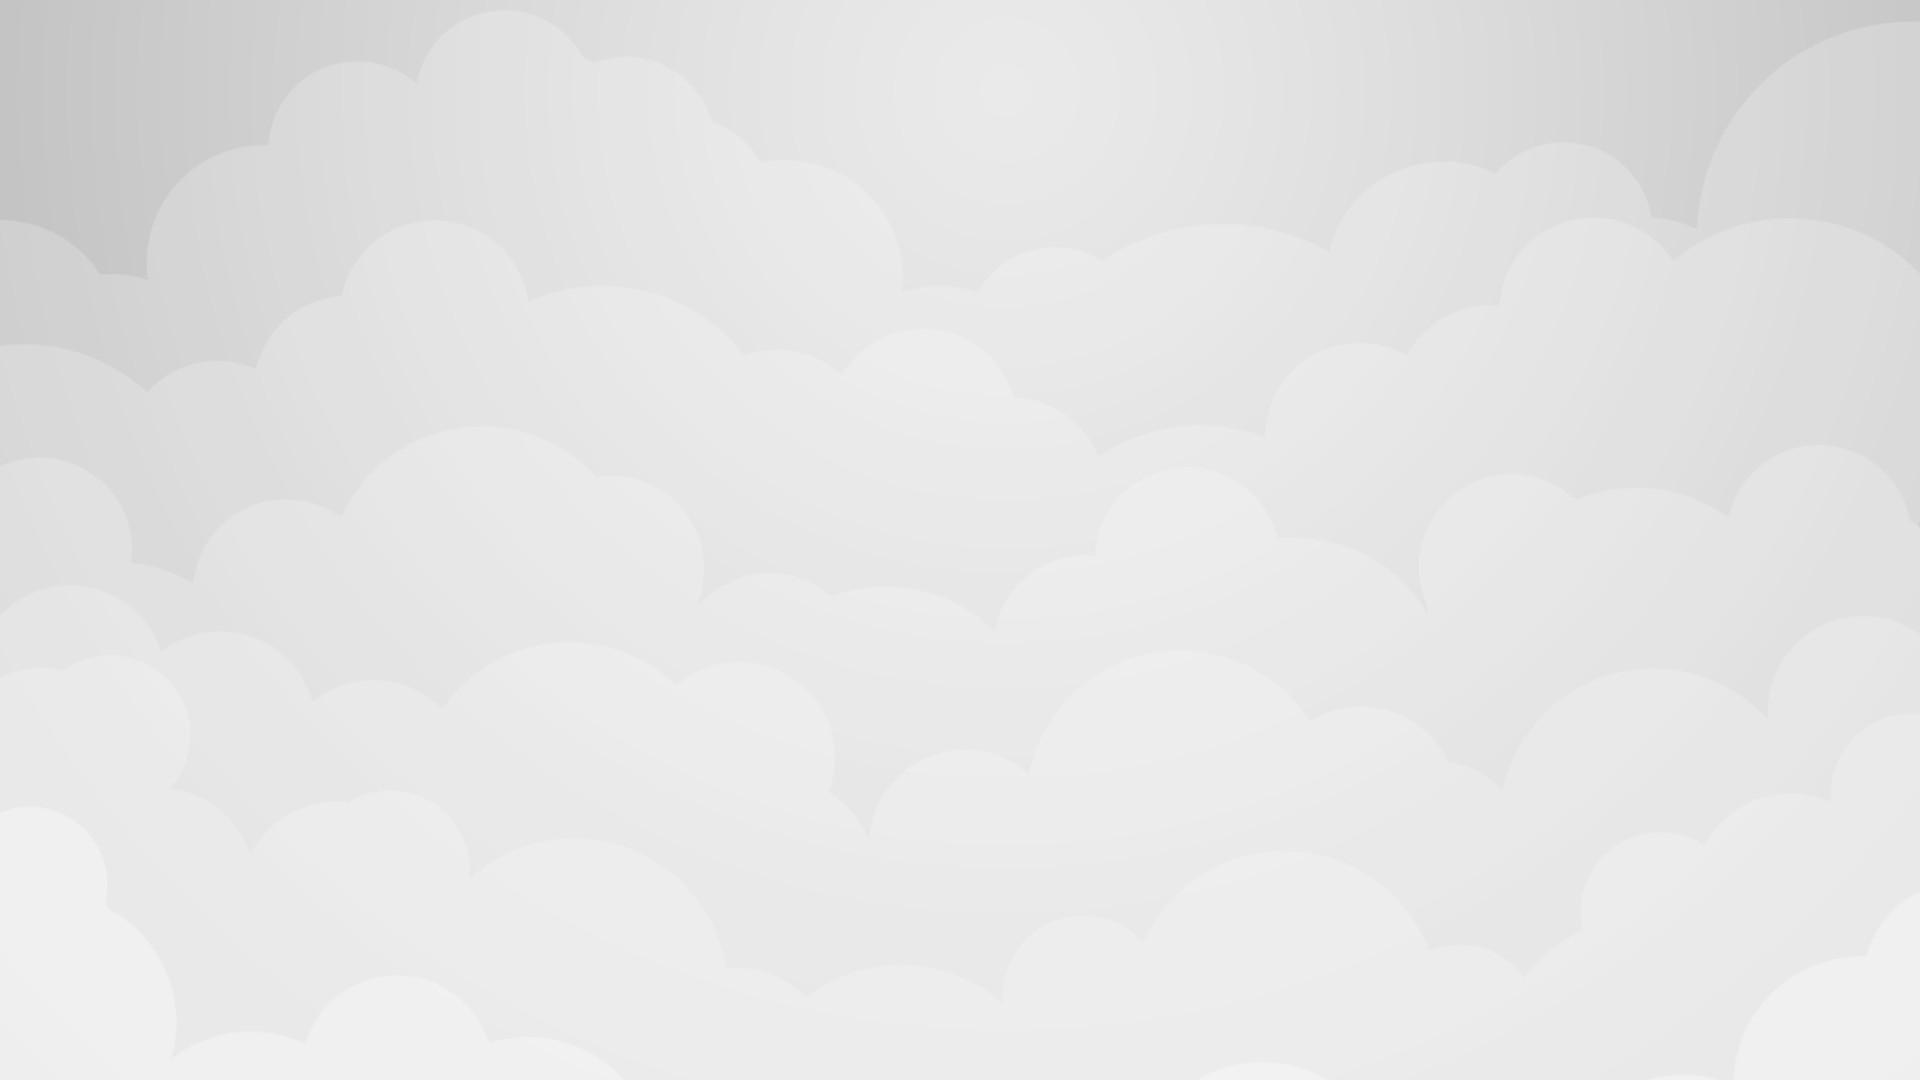 White Hd Desktop Wallpapers For Widescreen Fullscreen High Definition Dual  Monitors Mobile